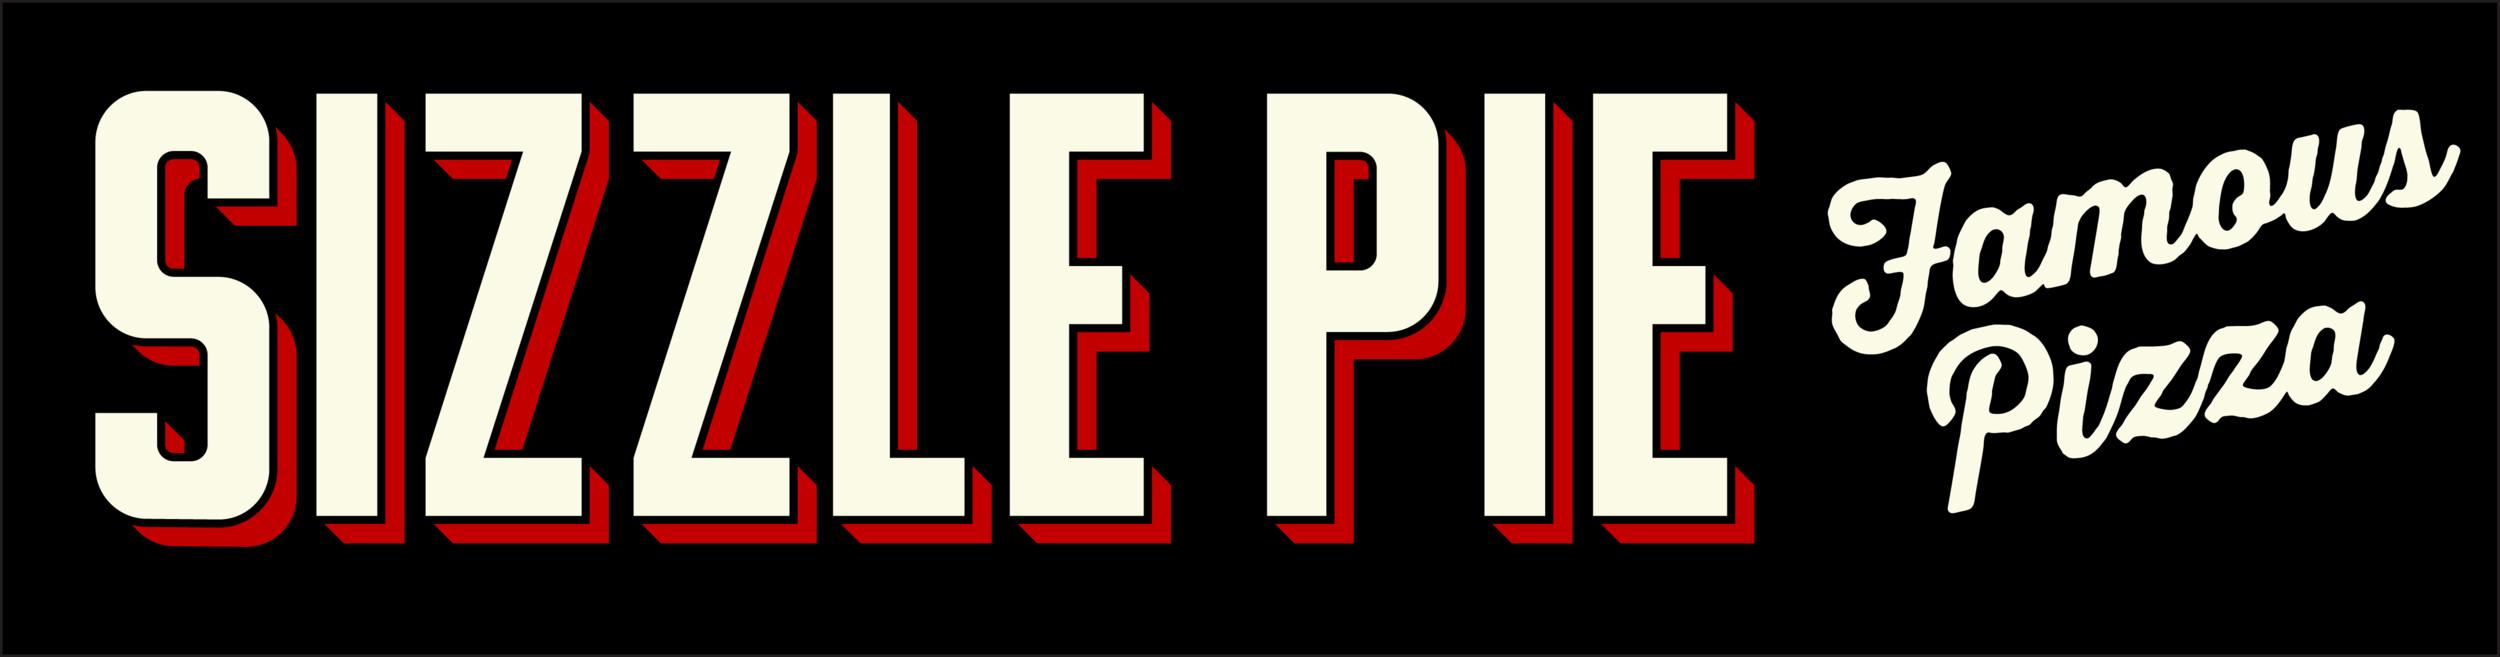 SizzlePie-FamousPizza_logo-light.png